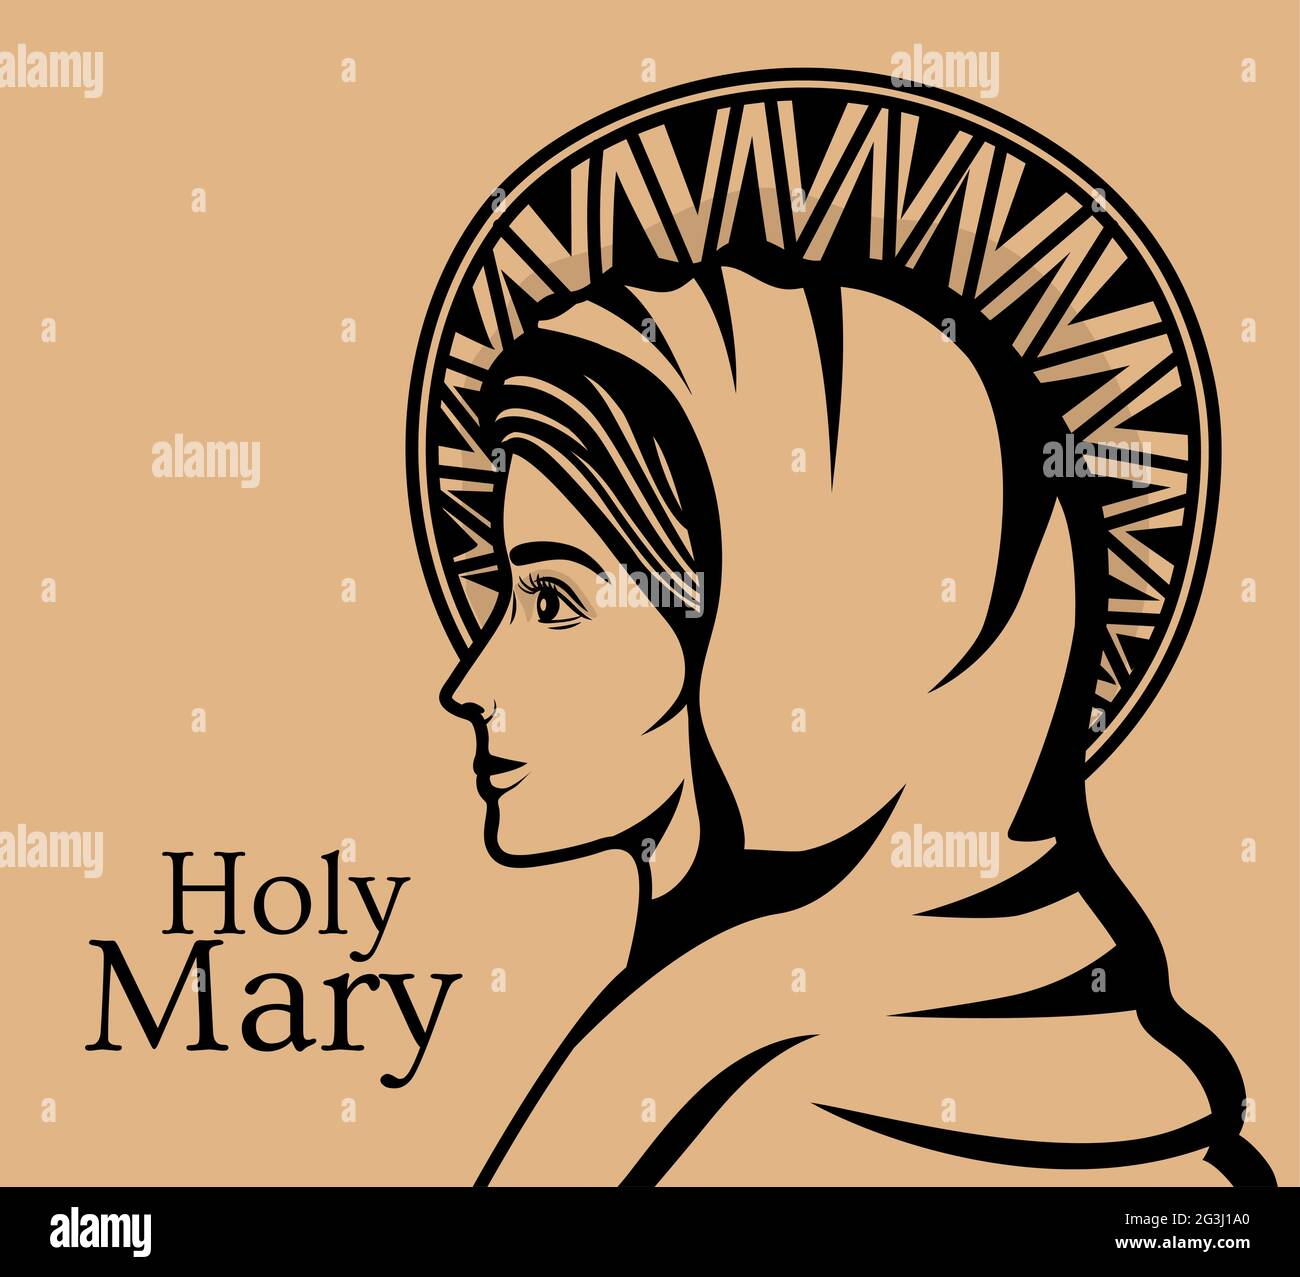 holy mary illustration Stock Vector